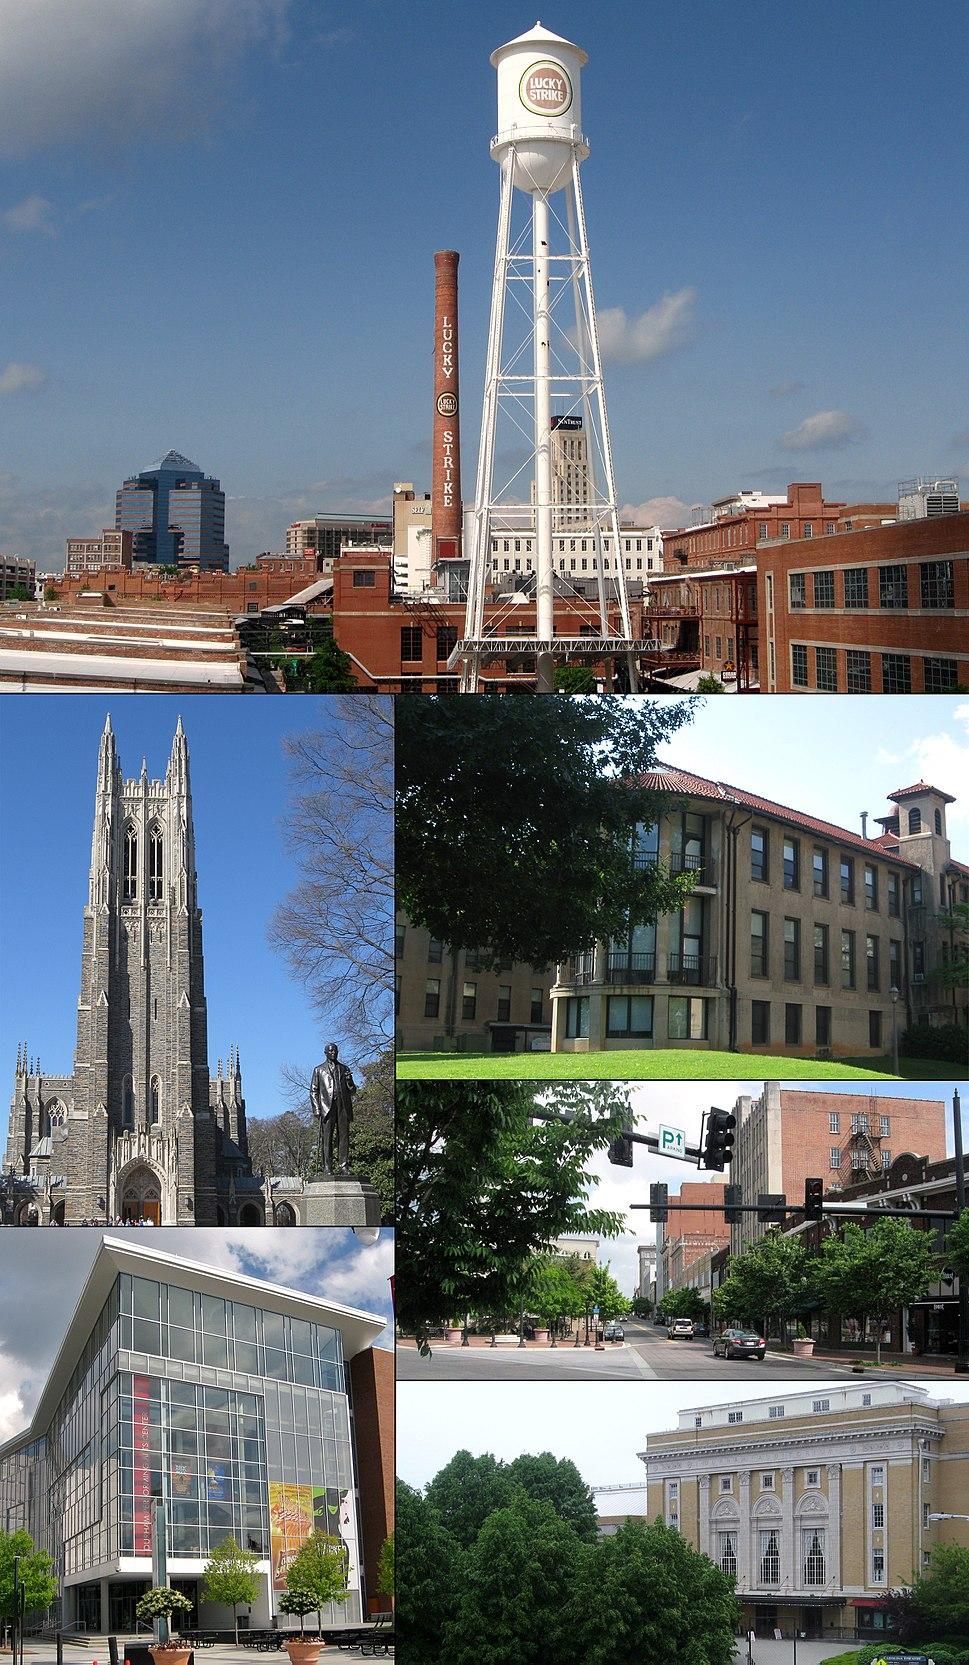 Clockwise from top: Durham skyline, North Carolina School of Science and Mathematics, Five Points, Carolina Theater, Durham Performing Arts Center, Duke Chapel